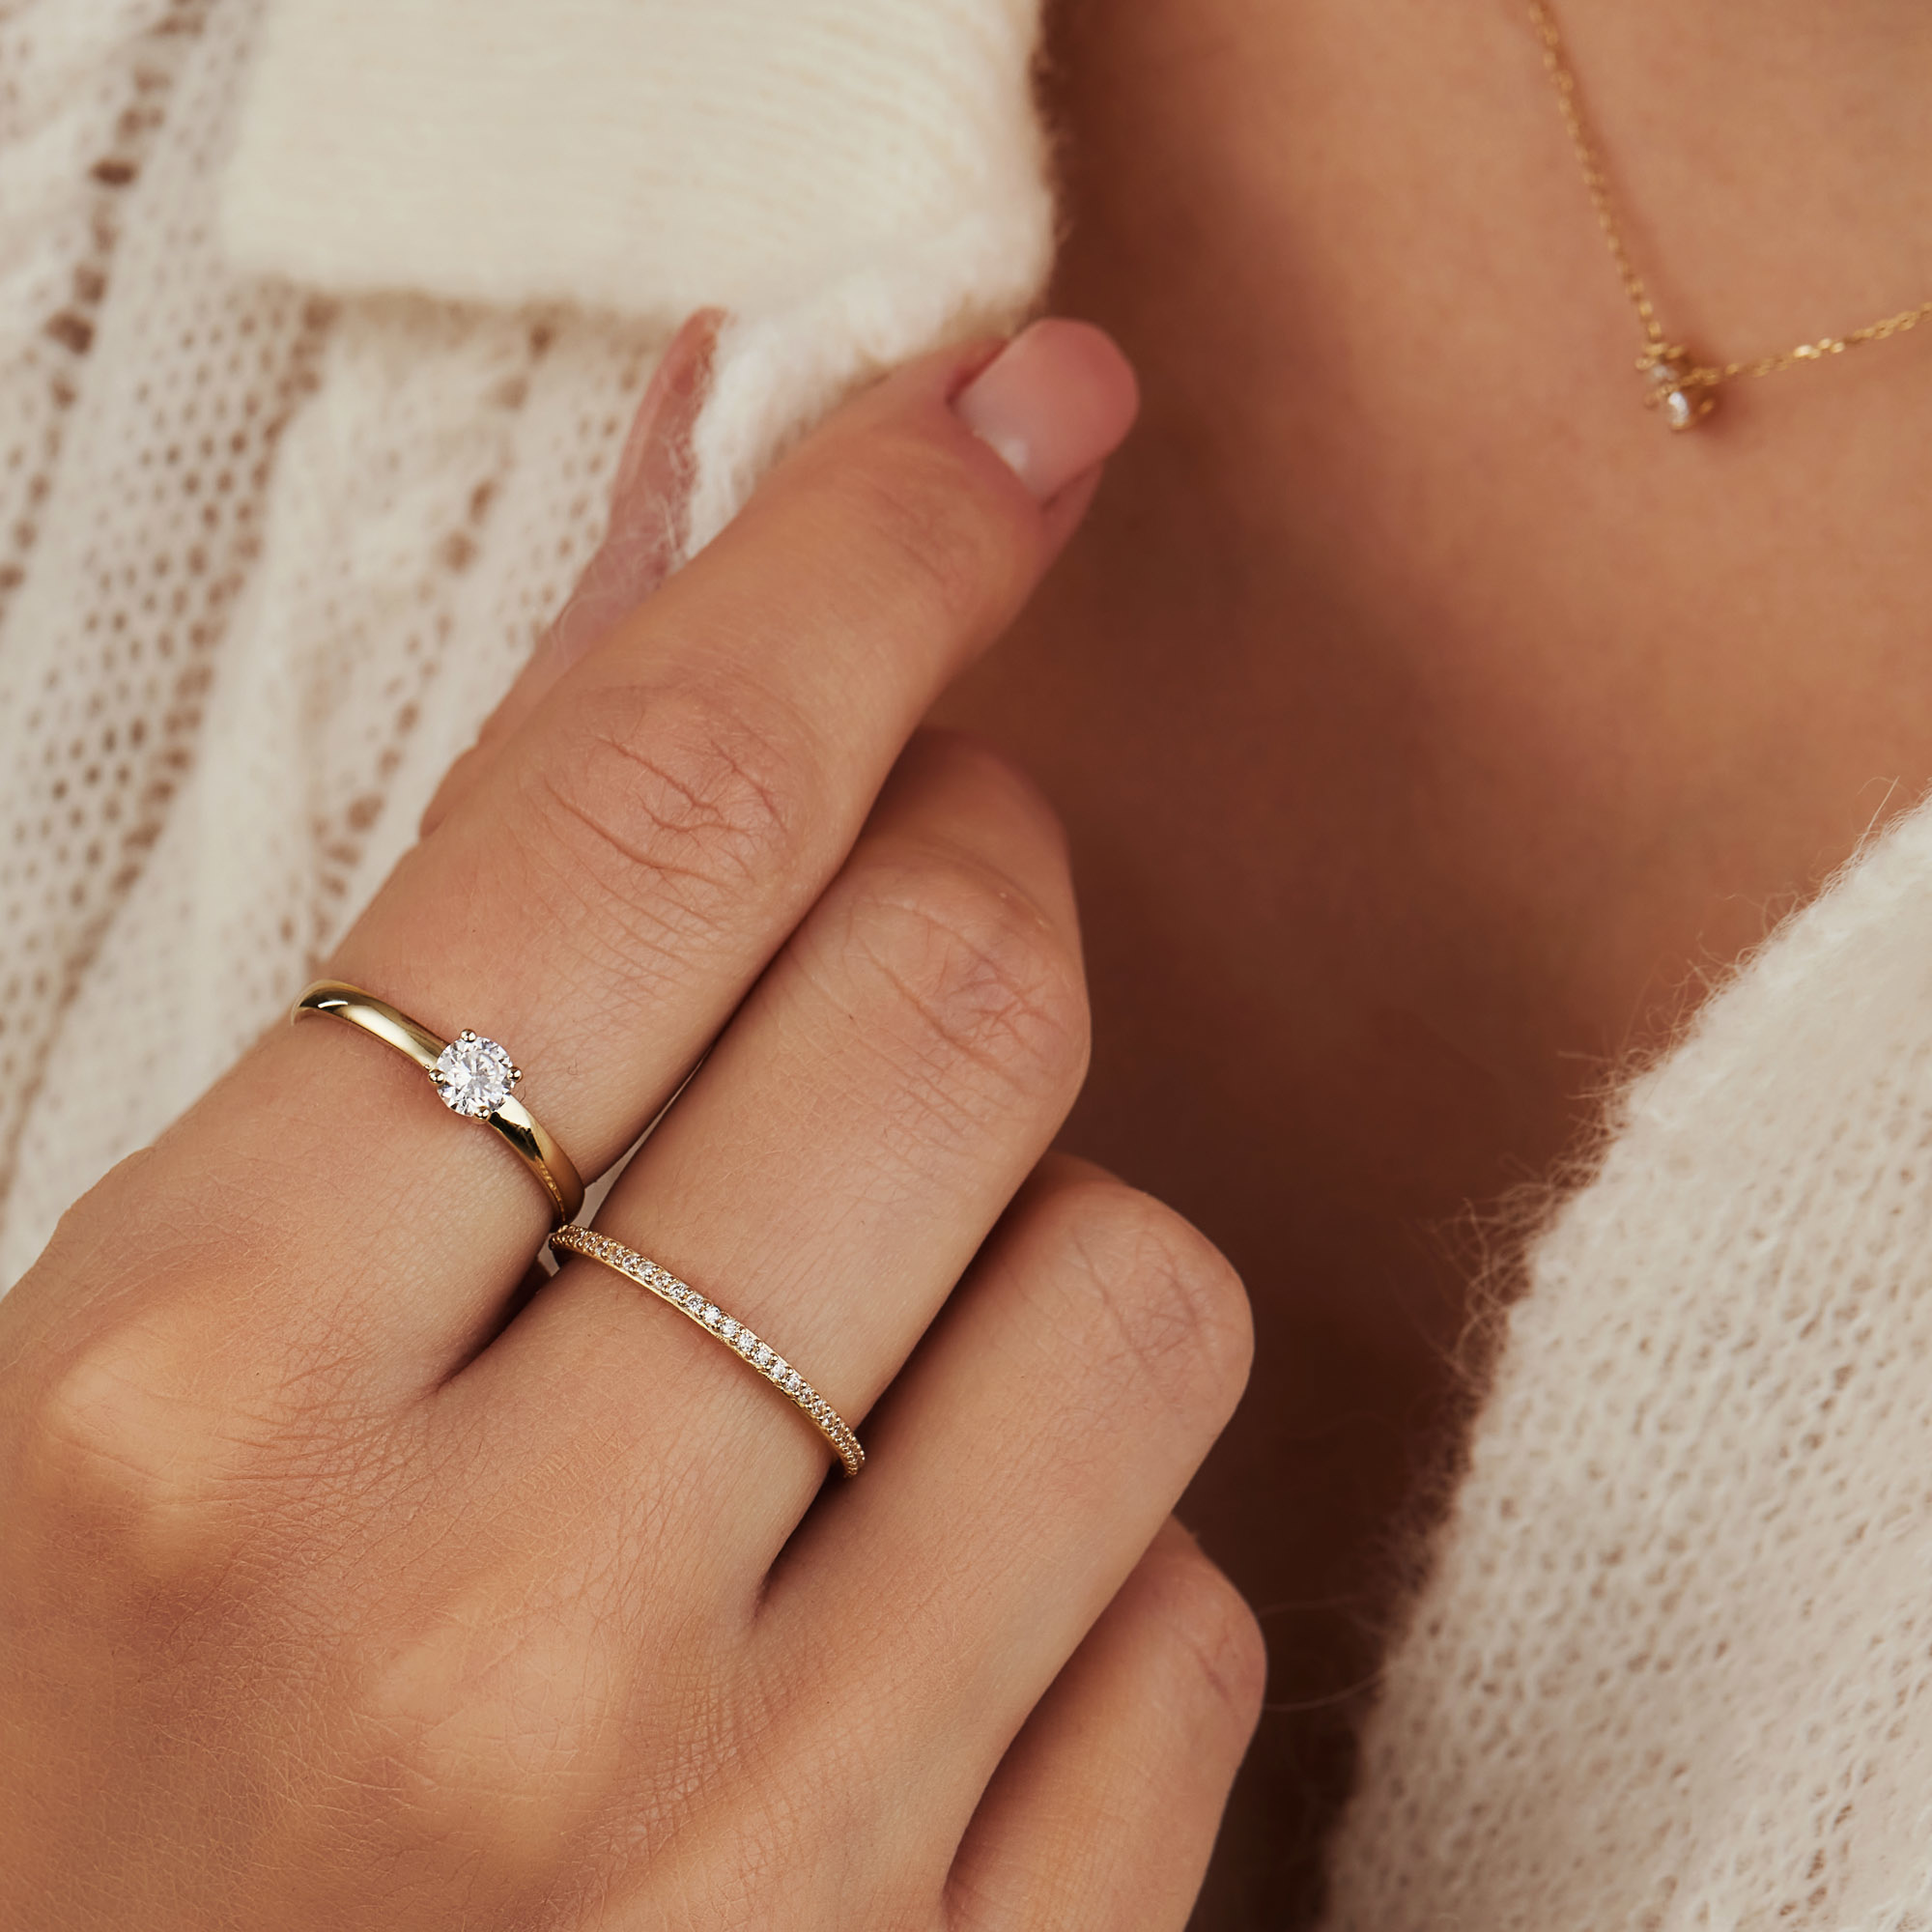 Isabel Bernard Asterope Stones bague superposables en or 14 carats